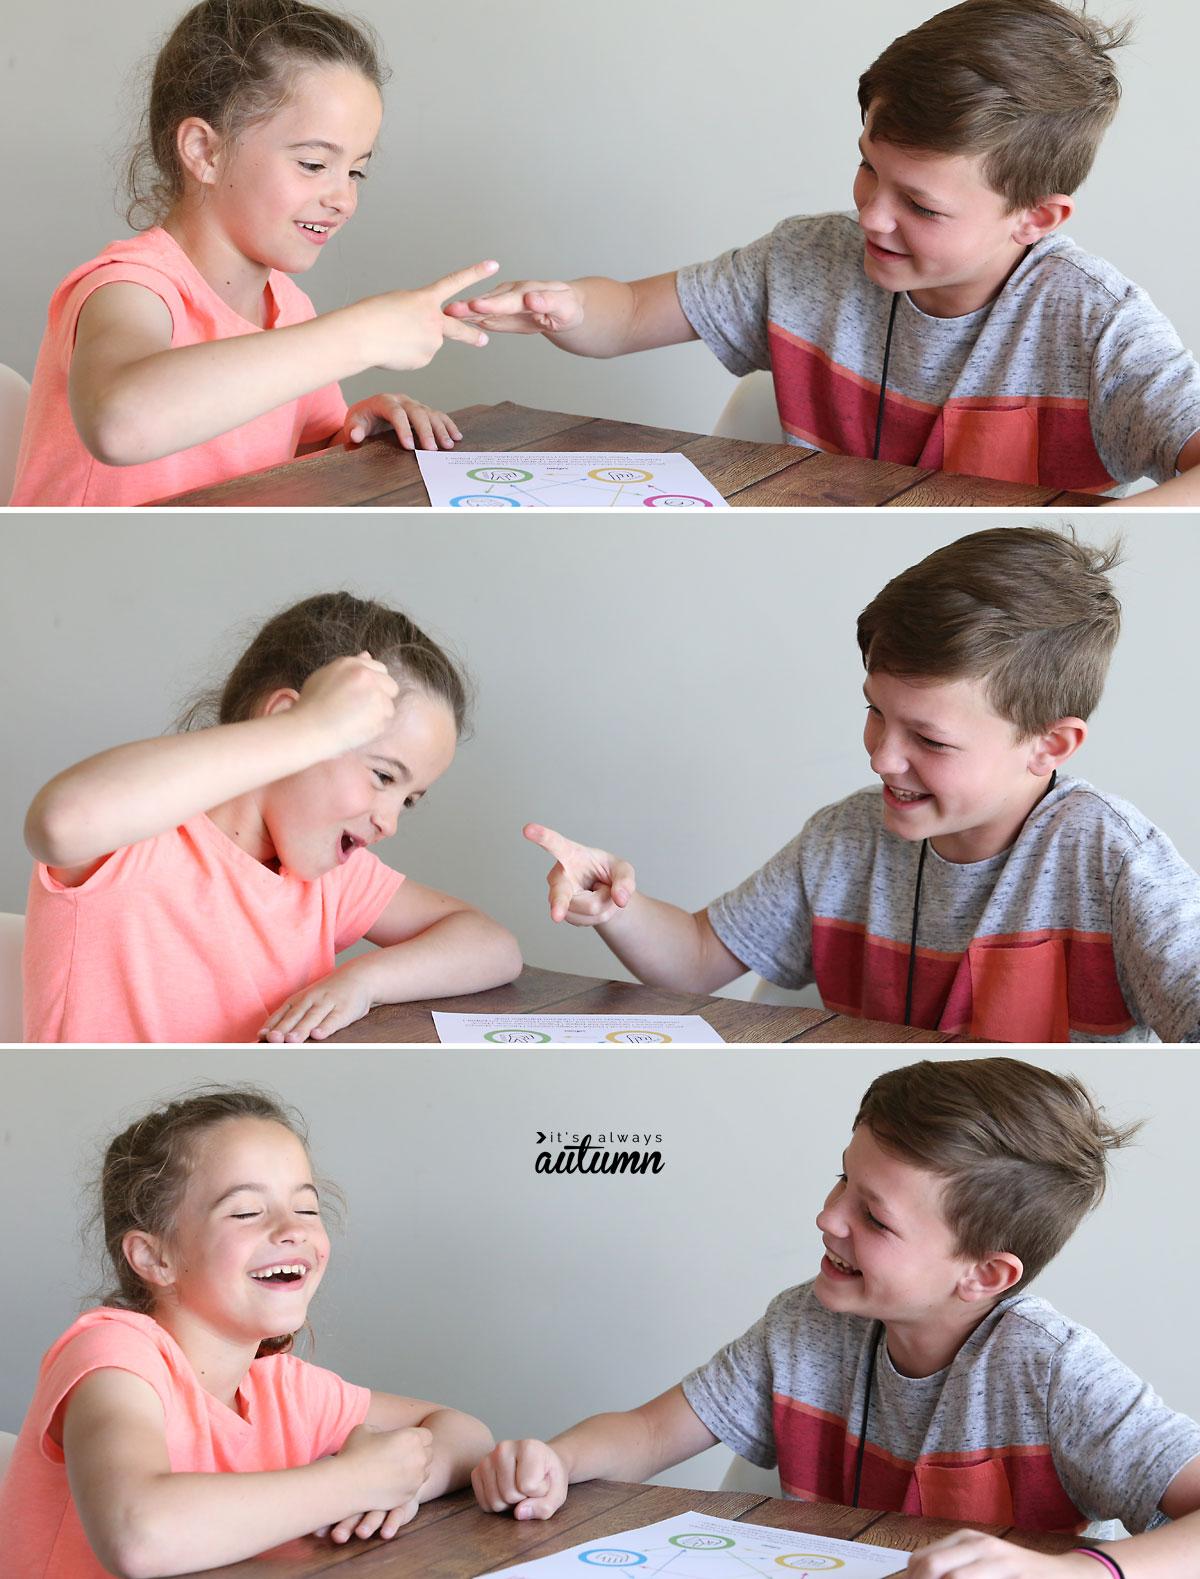 Little kids playing rock paper scissors